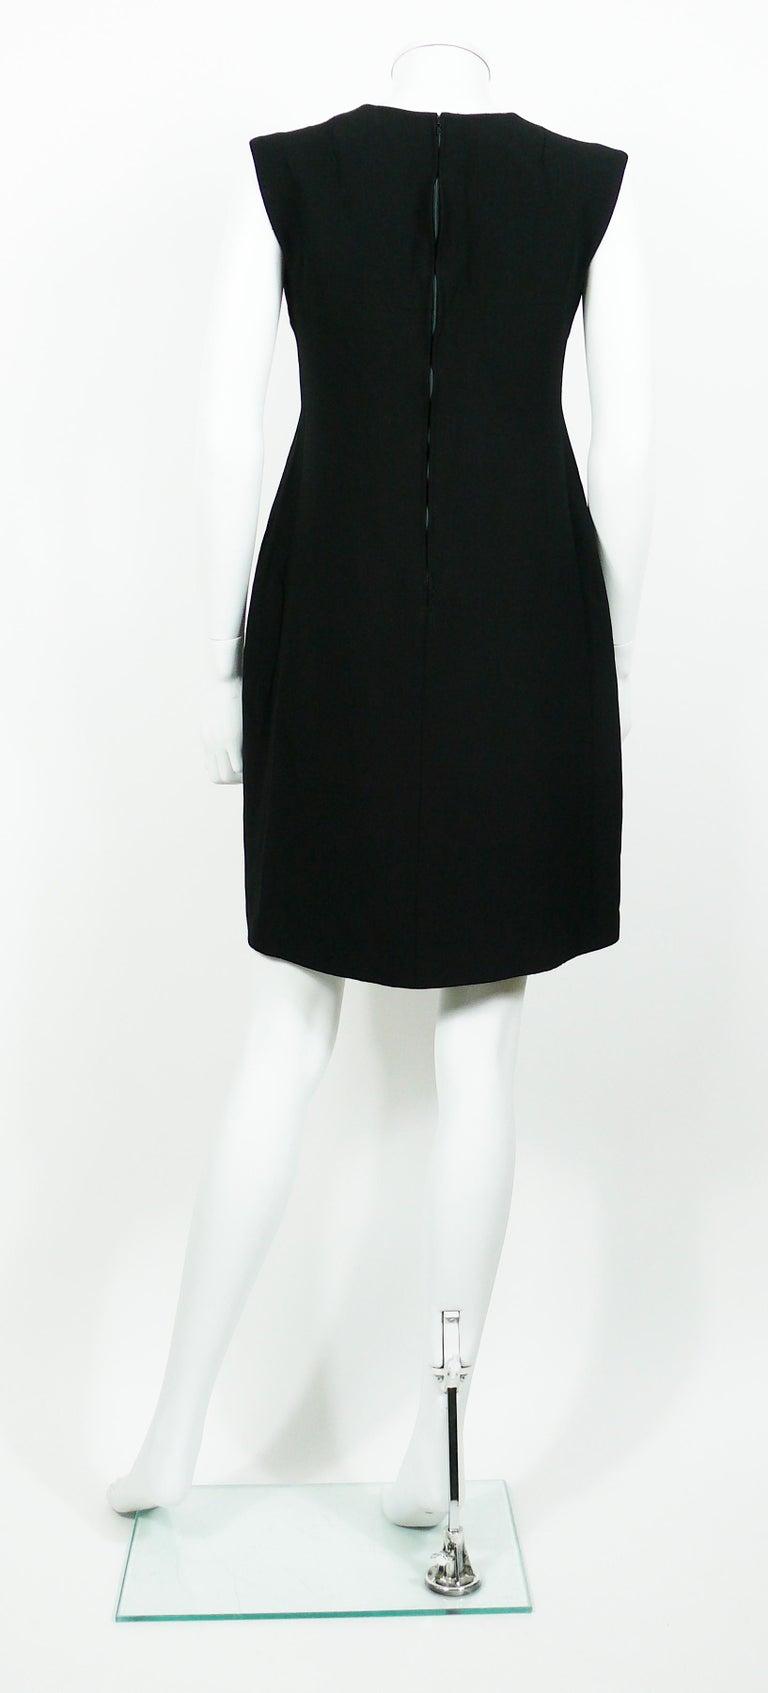 e0c4bf7aac3 Pierre Cardin Vintage Space Age Cut Out Circle Little Black Dress For Sale 1